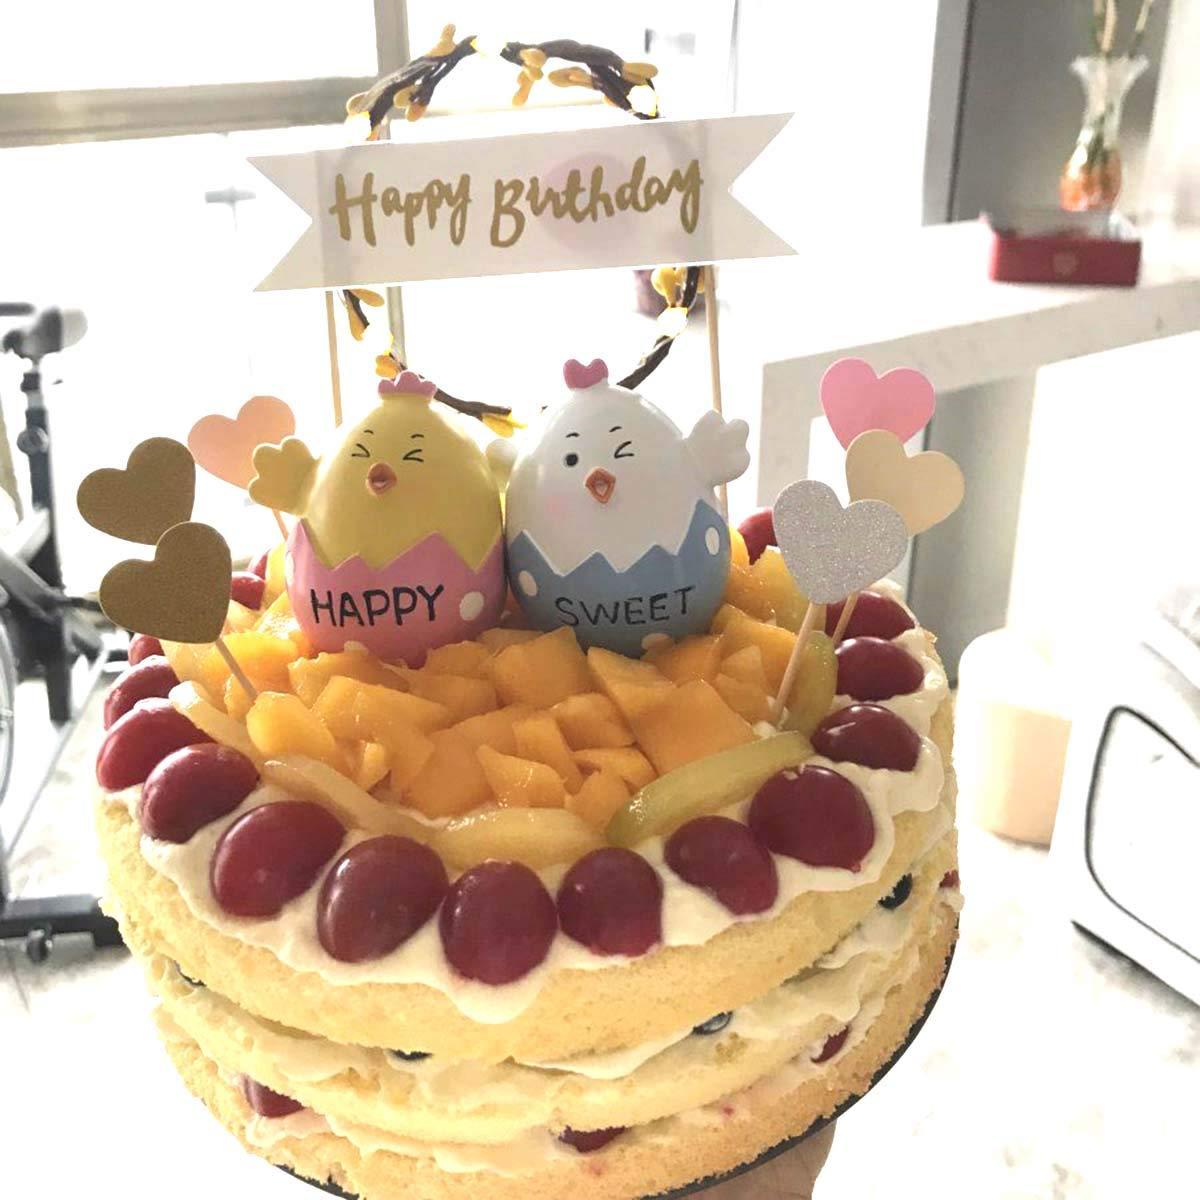 LED Fruits Wreath Cake Insert Card Birthday Party Dessert Cake Decoration Tools